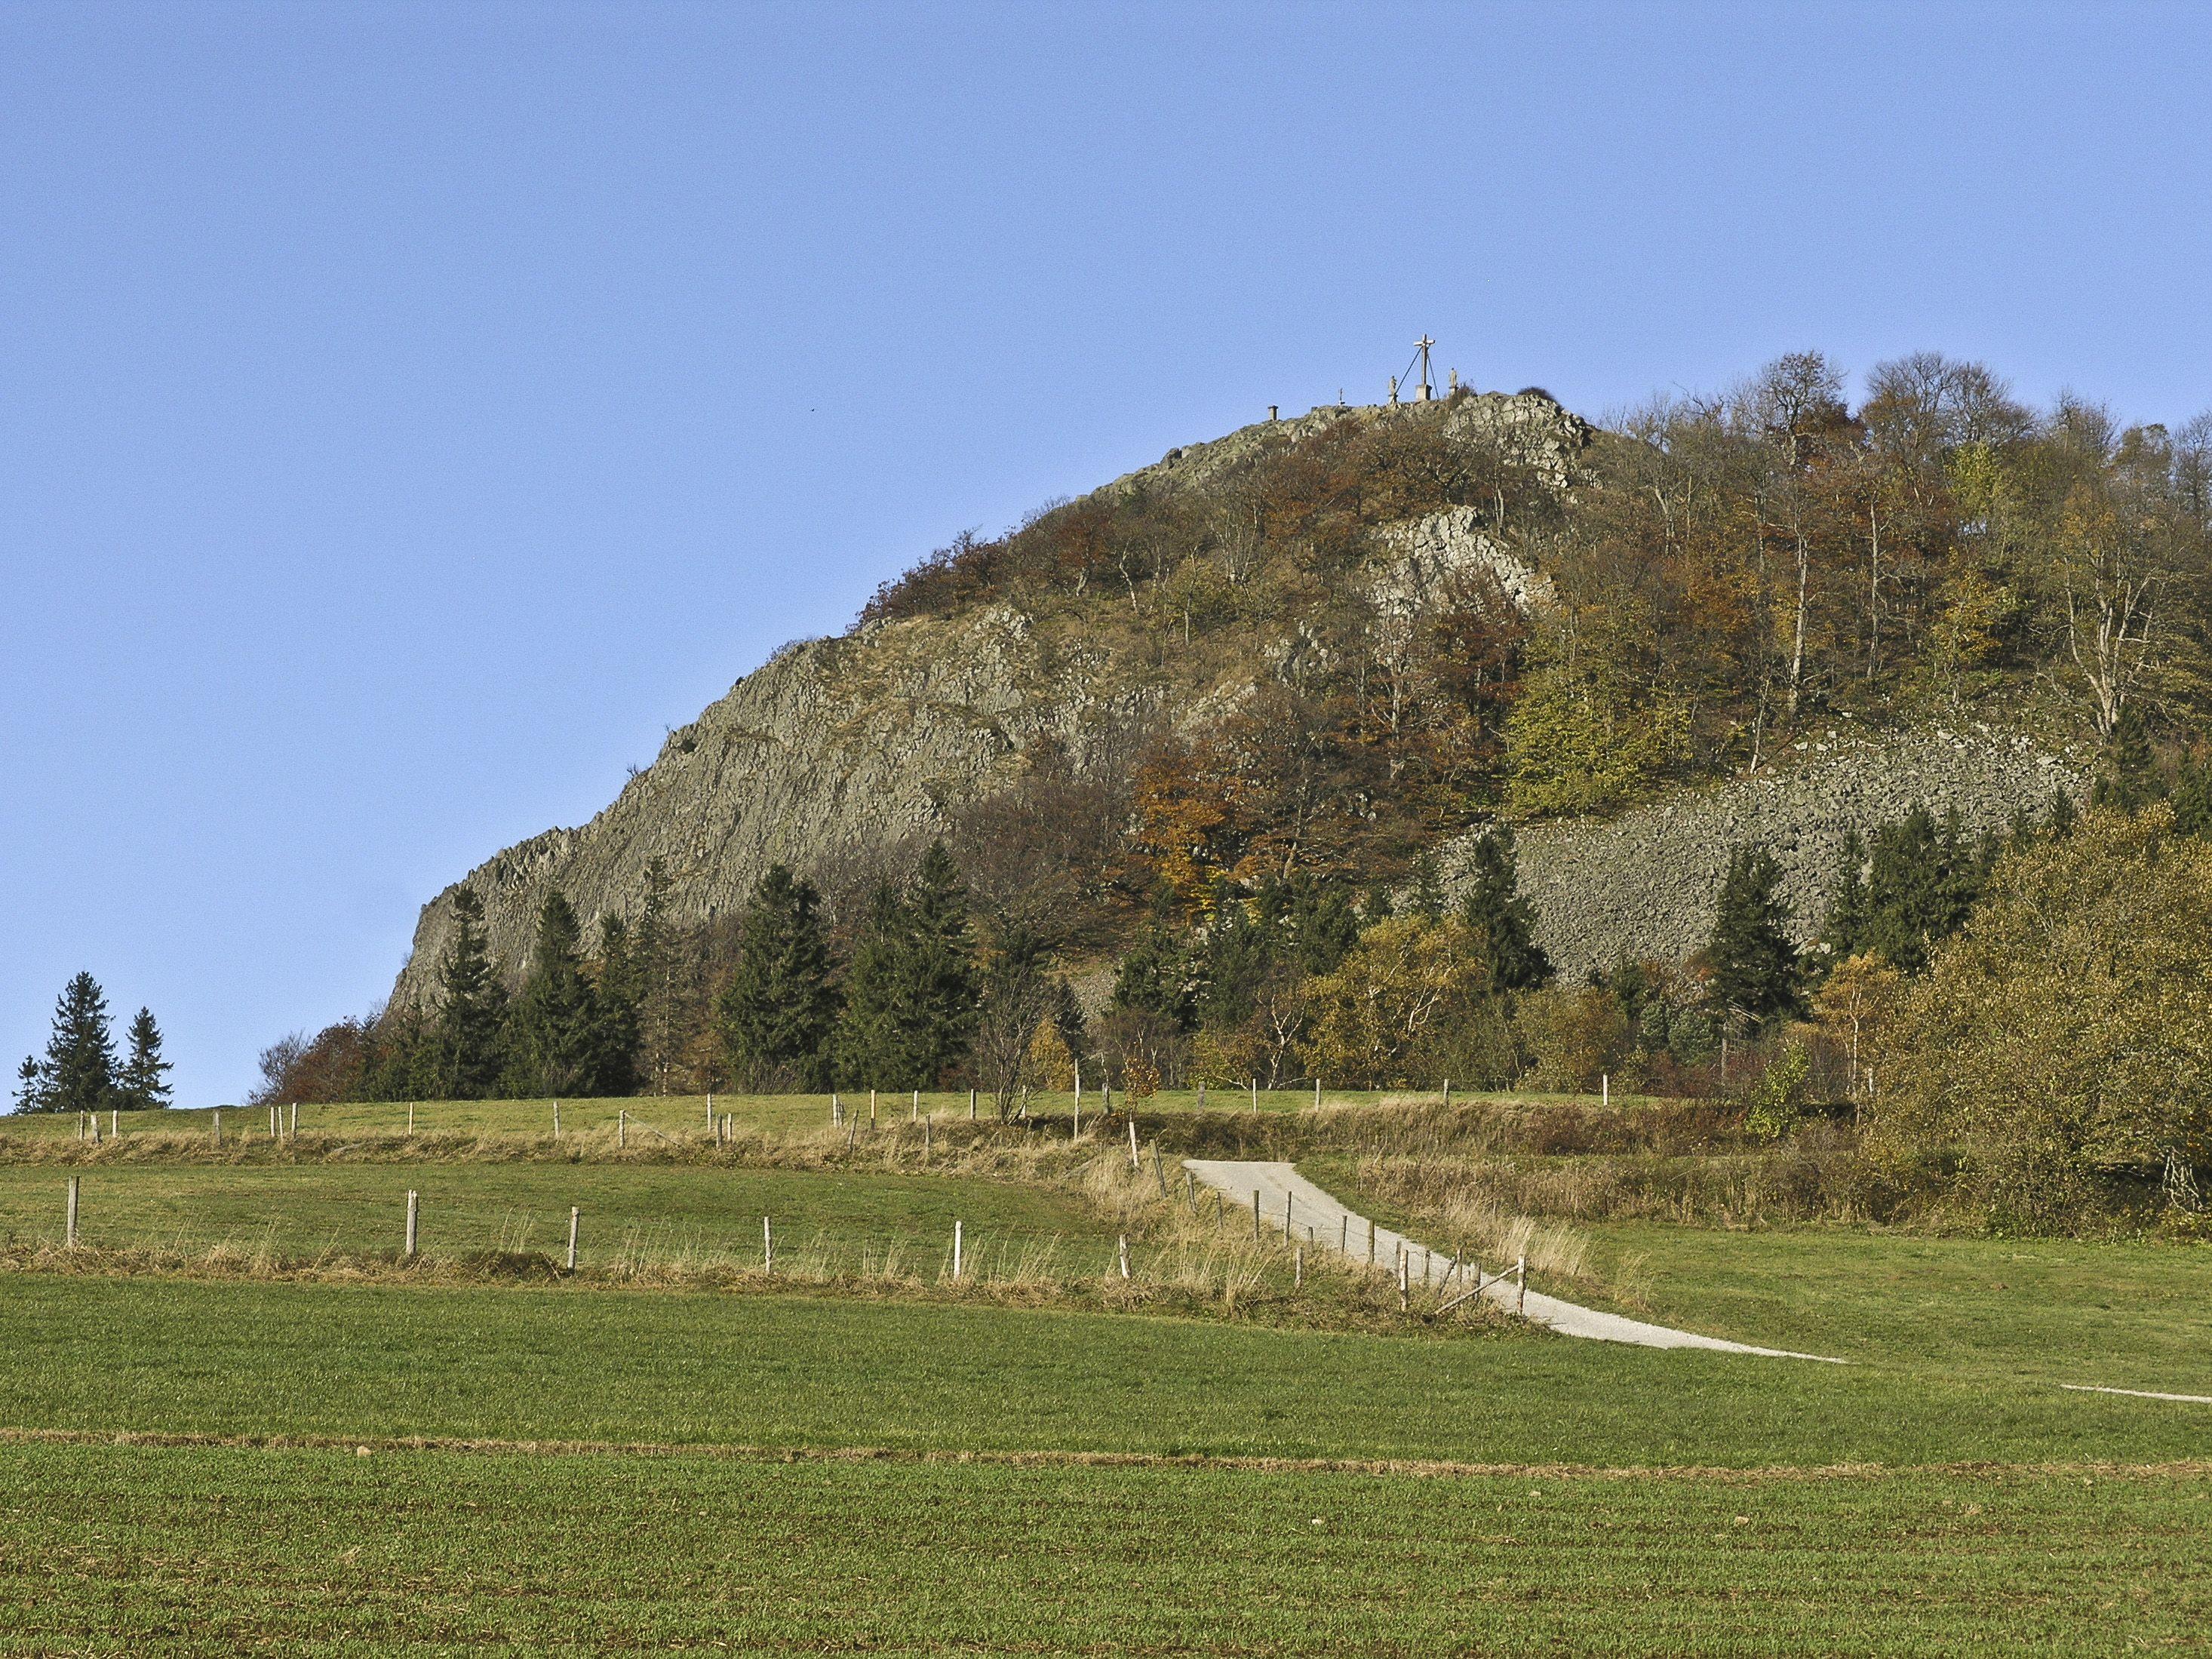 Extratour Milseburg Blick Auf Die Milseburg Natur Landschaft Wandern